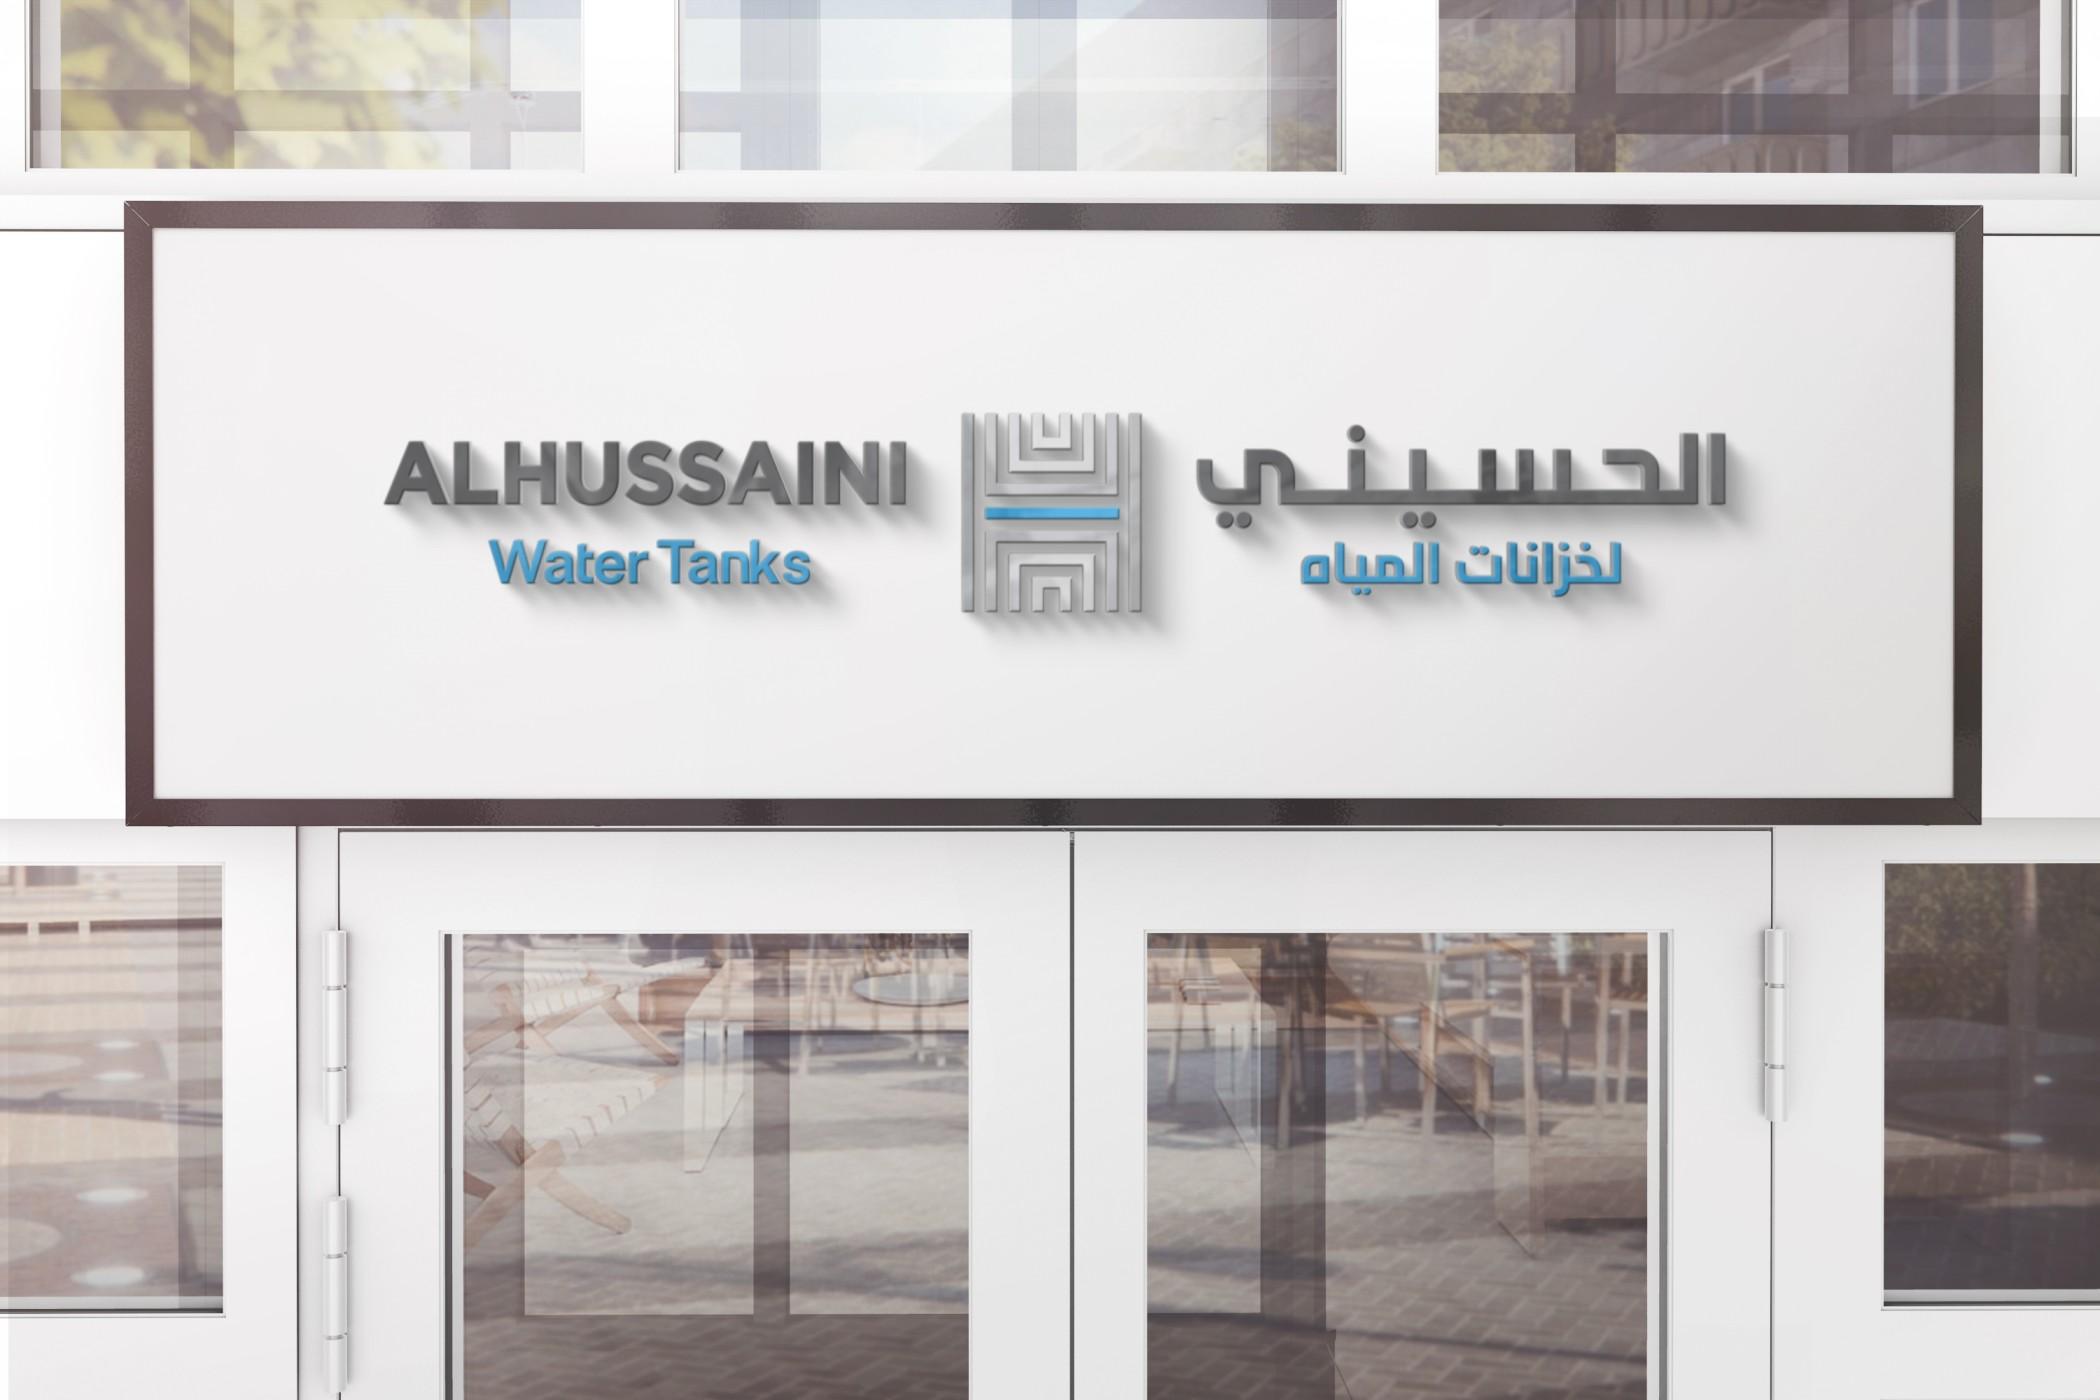 Al Hussaini